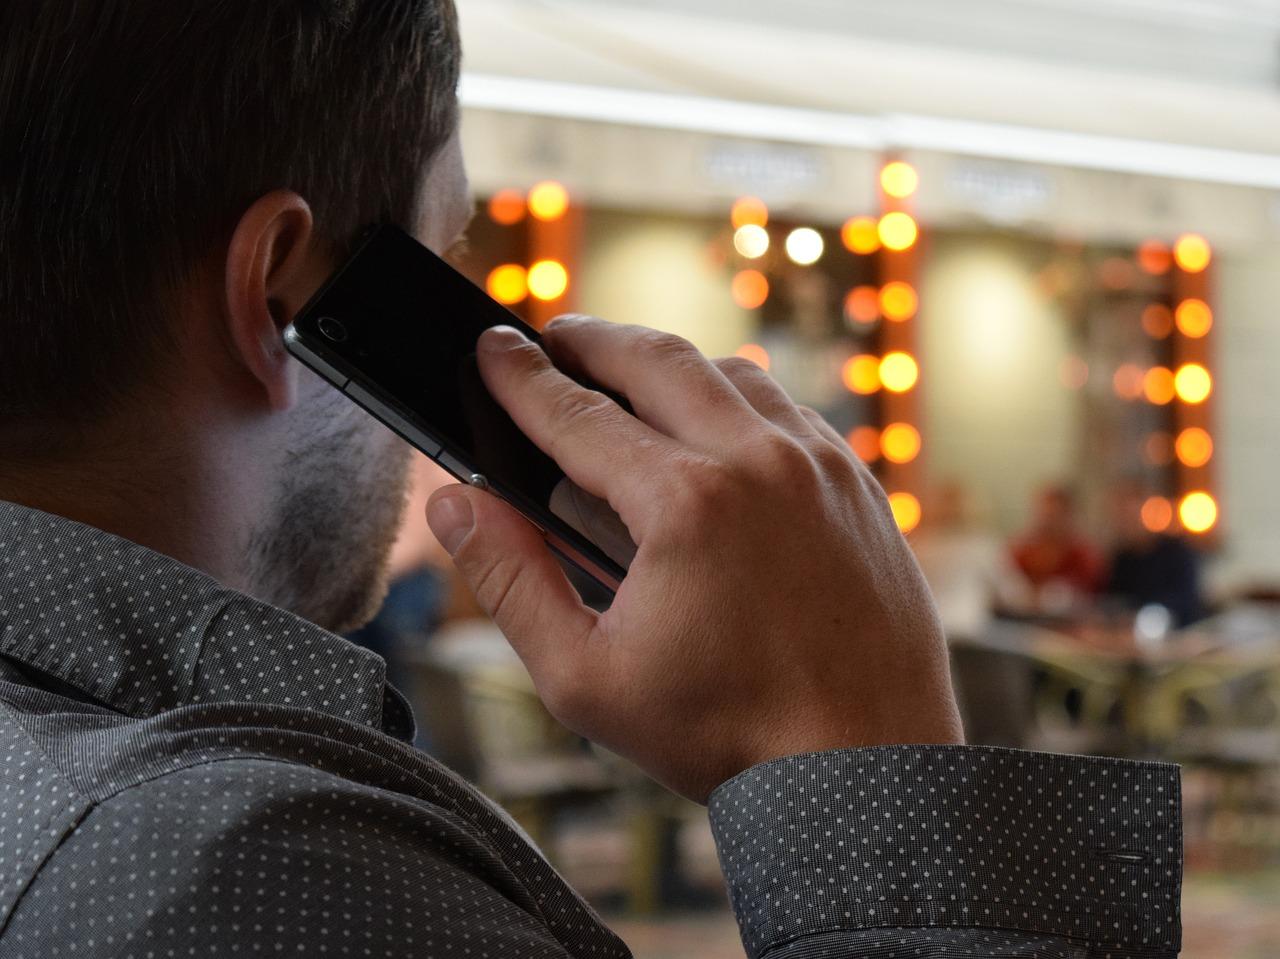 man-talking-on-the-phone-1582238_1280.jpg